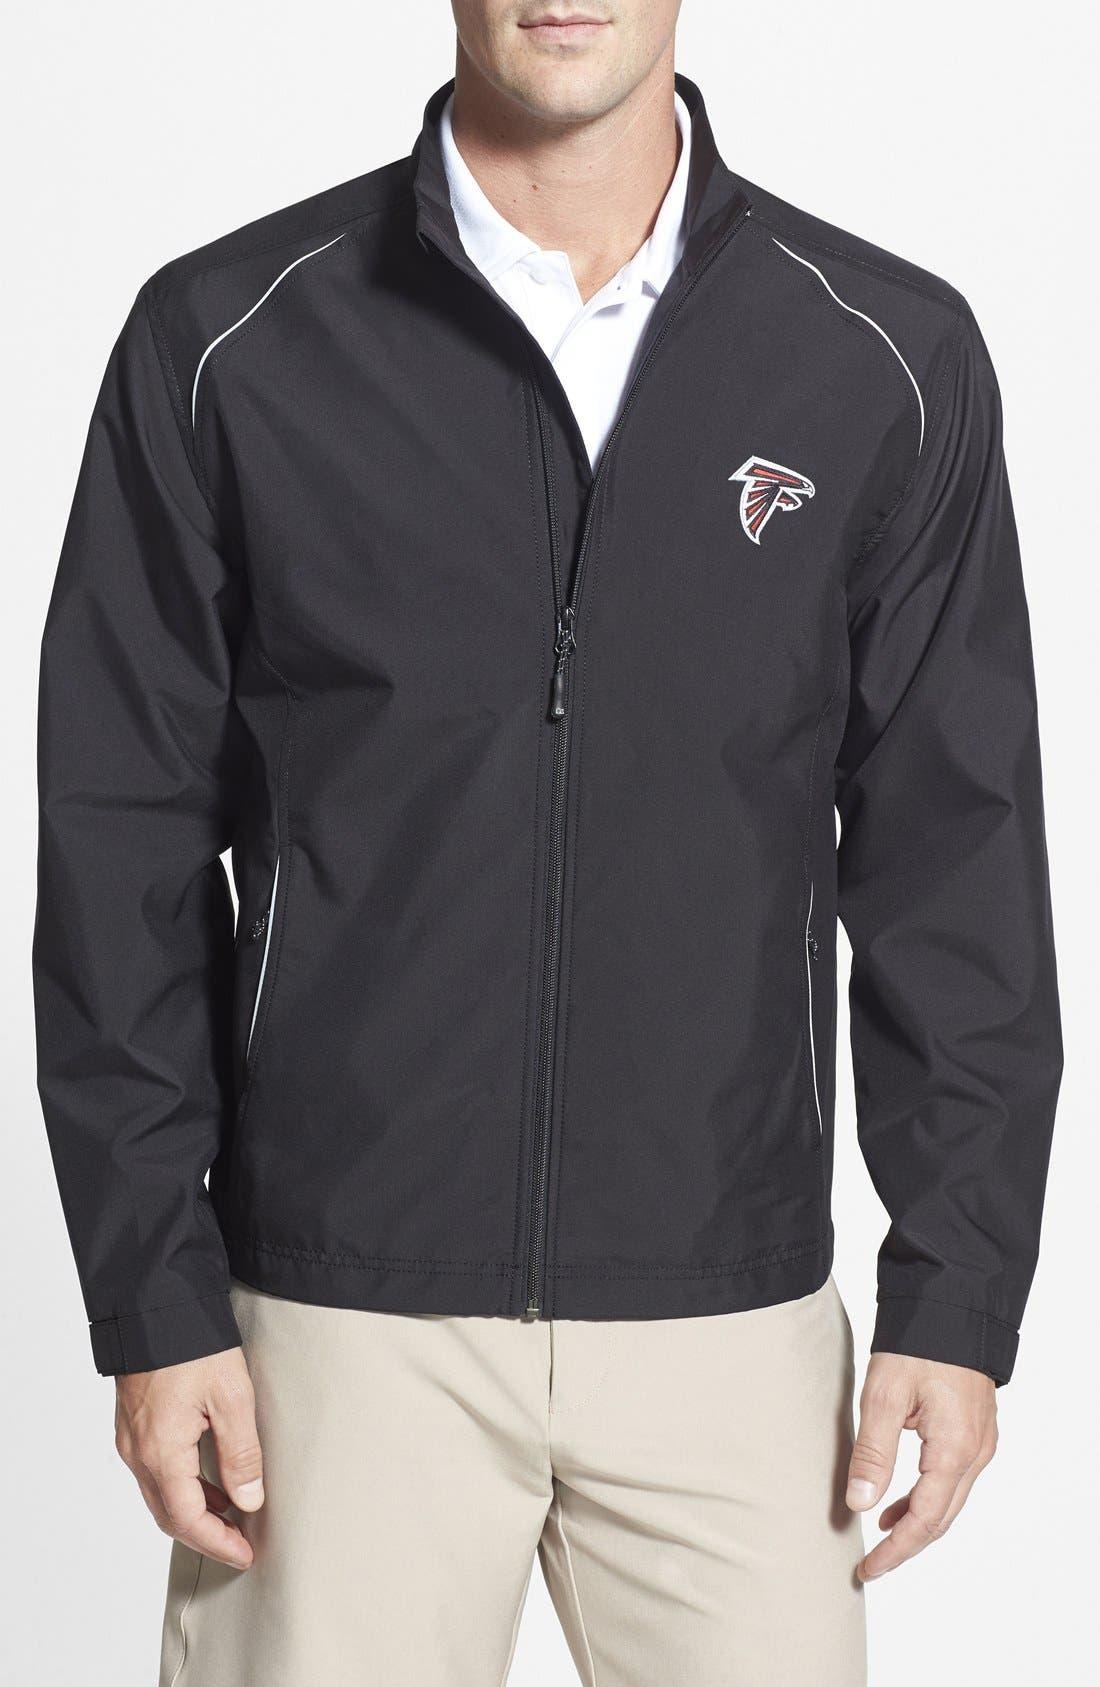 Cutter & Buck Atlanta Falcons - Beacon WeatherTec Wind & Water Resistant Jacket